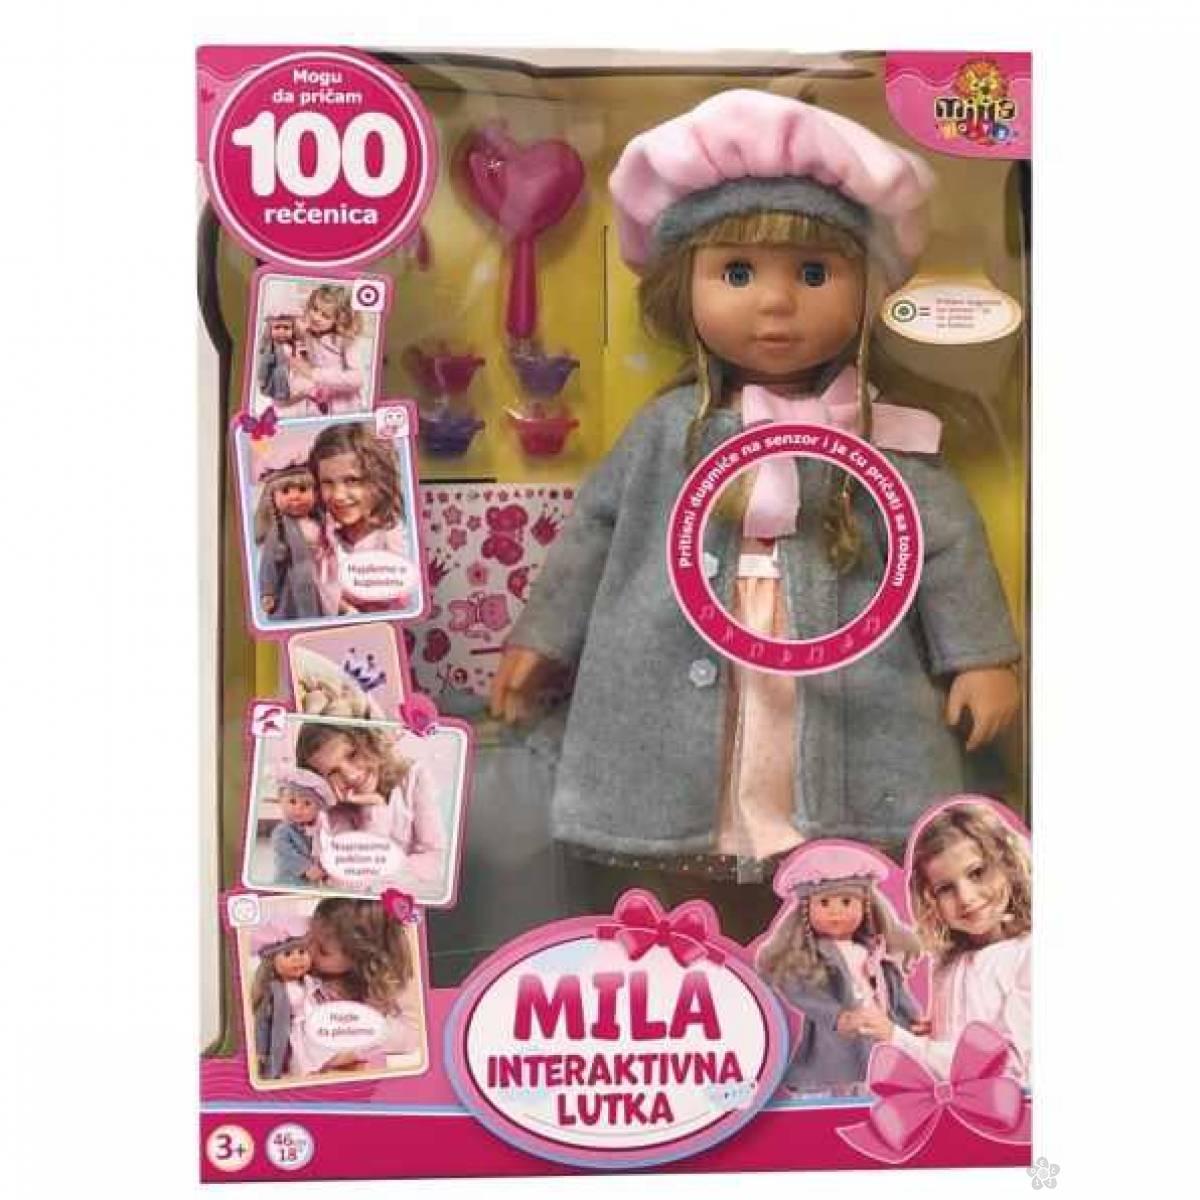 Interaktivna lutka MILA, 100 rečenica